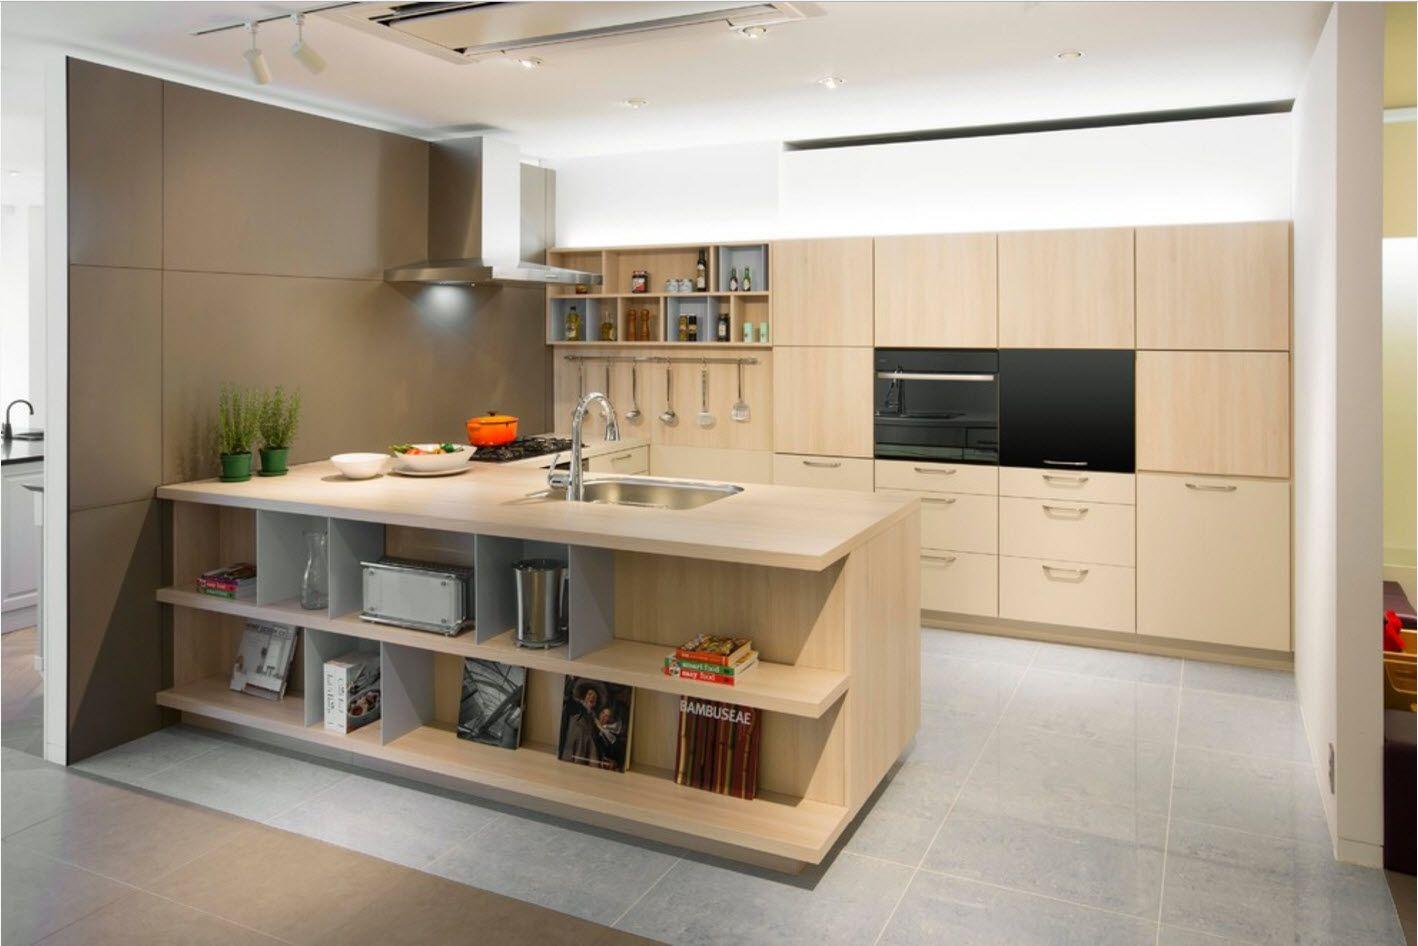 40 Square Feet Kitchen Modern Dedign Ideas & Layout Types. Gorgeous wooden kitchen set texture